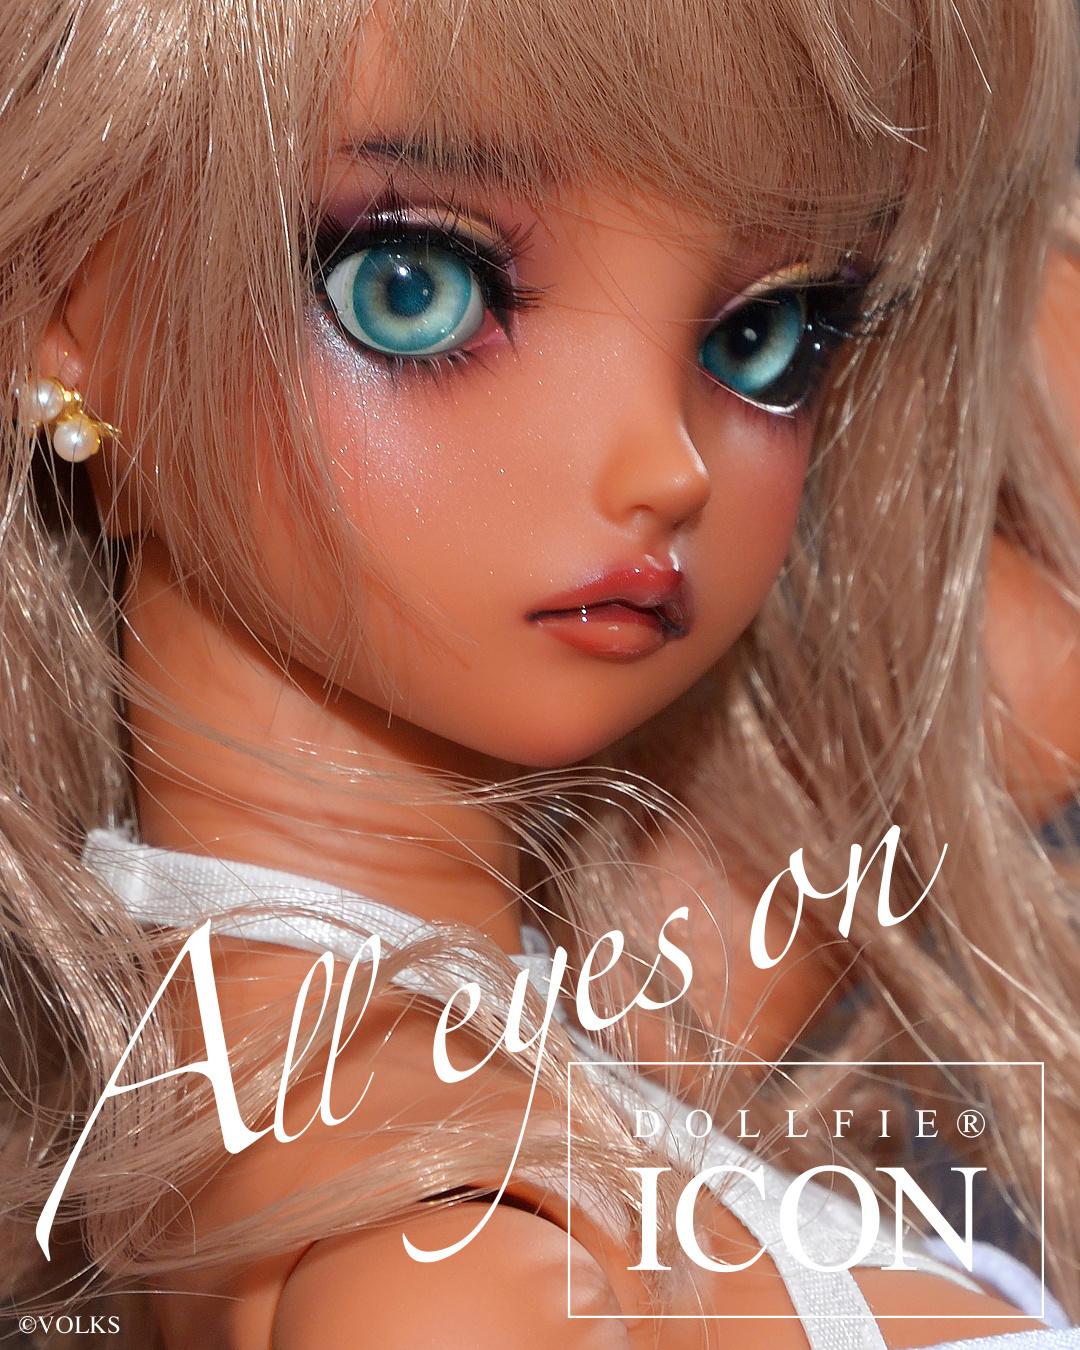 [Volks] Dollfie Icon - Lilac, Clover, Serra, Terra - Page 4 Icon_s14